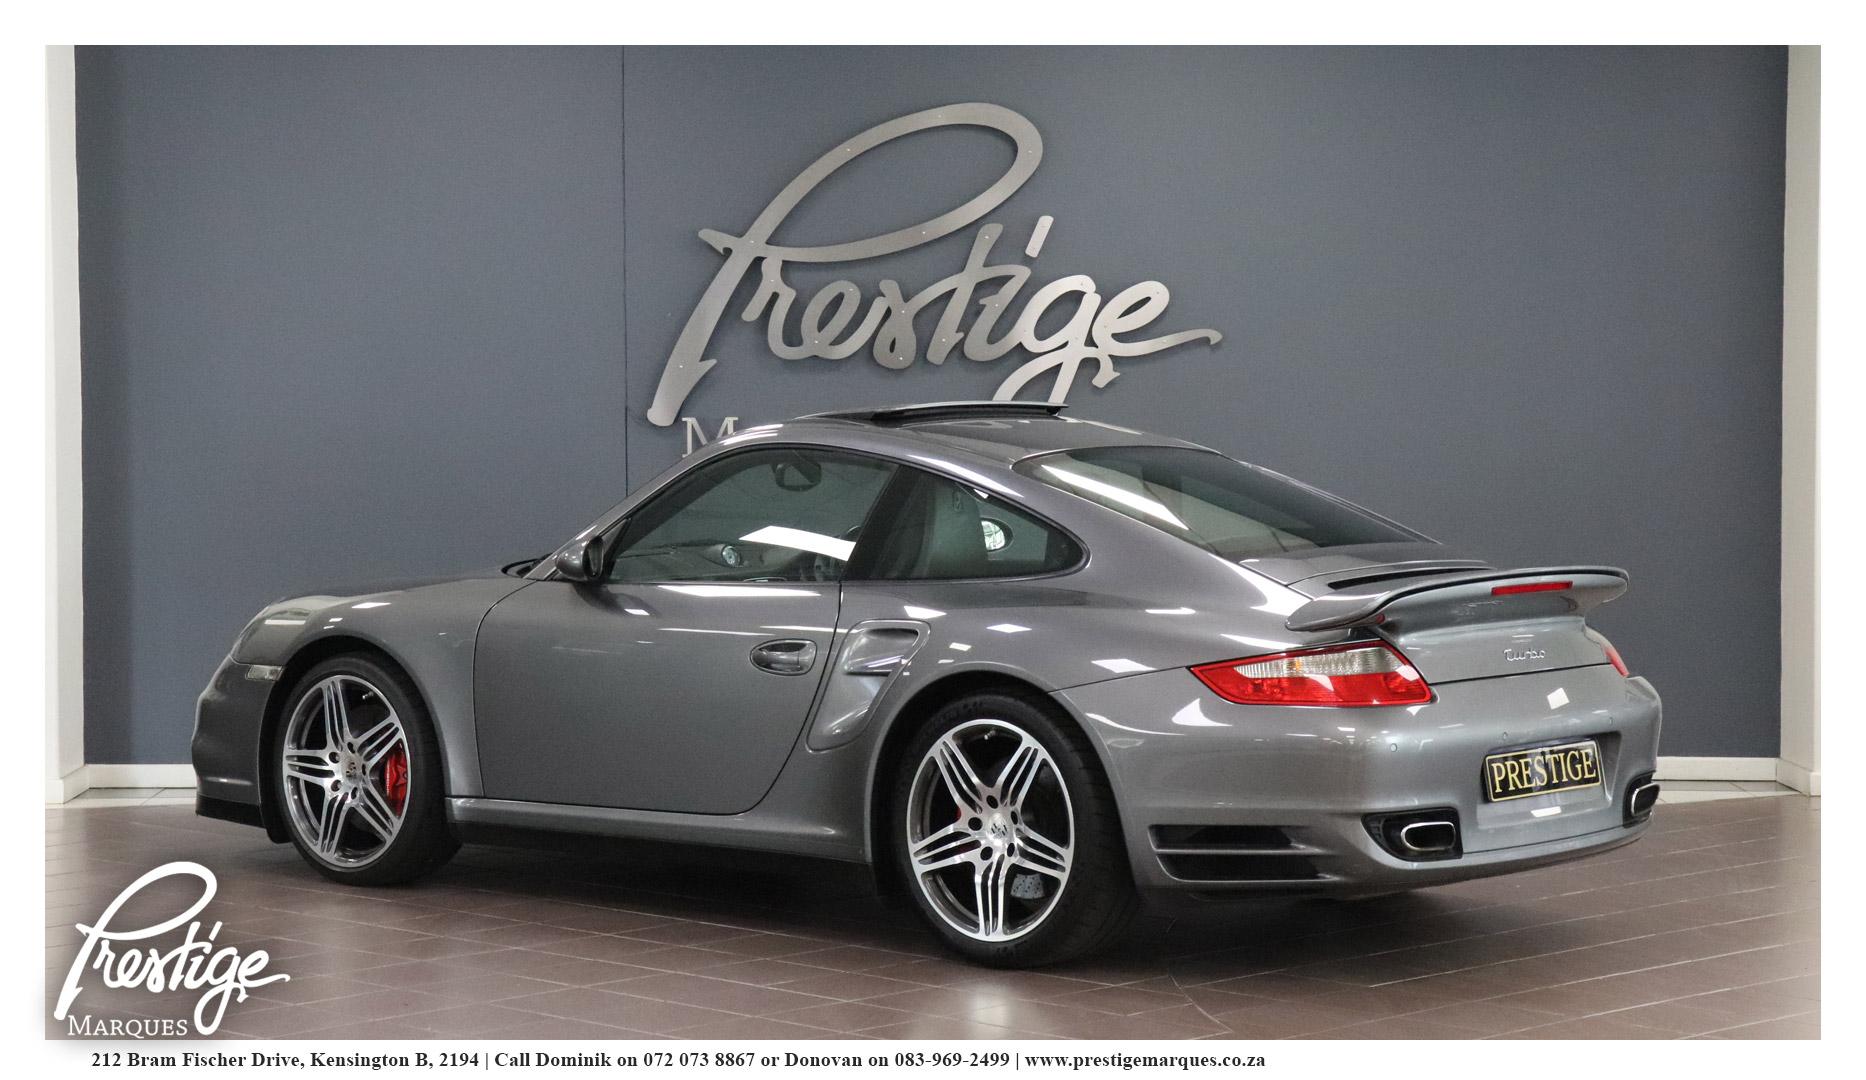 2008-Porsche-911-997-Turbo-Tiptronic-Prestige-Marques-Randburg-Sandton-5